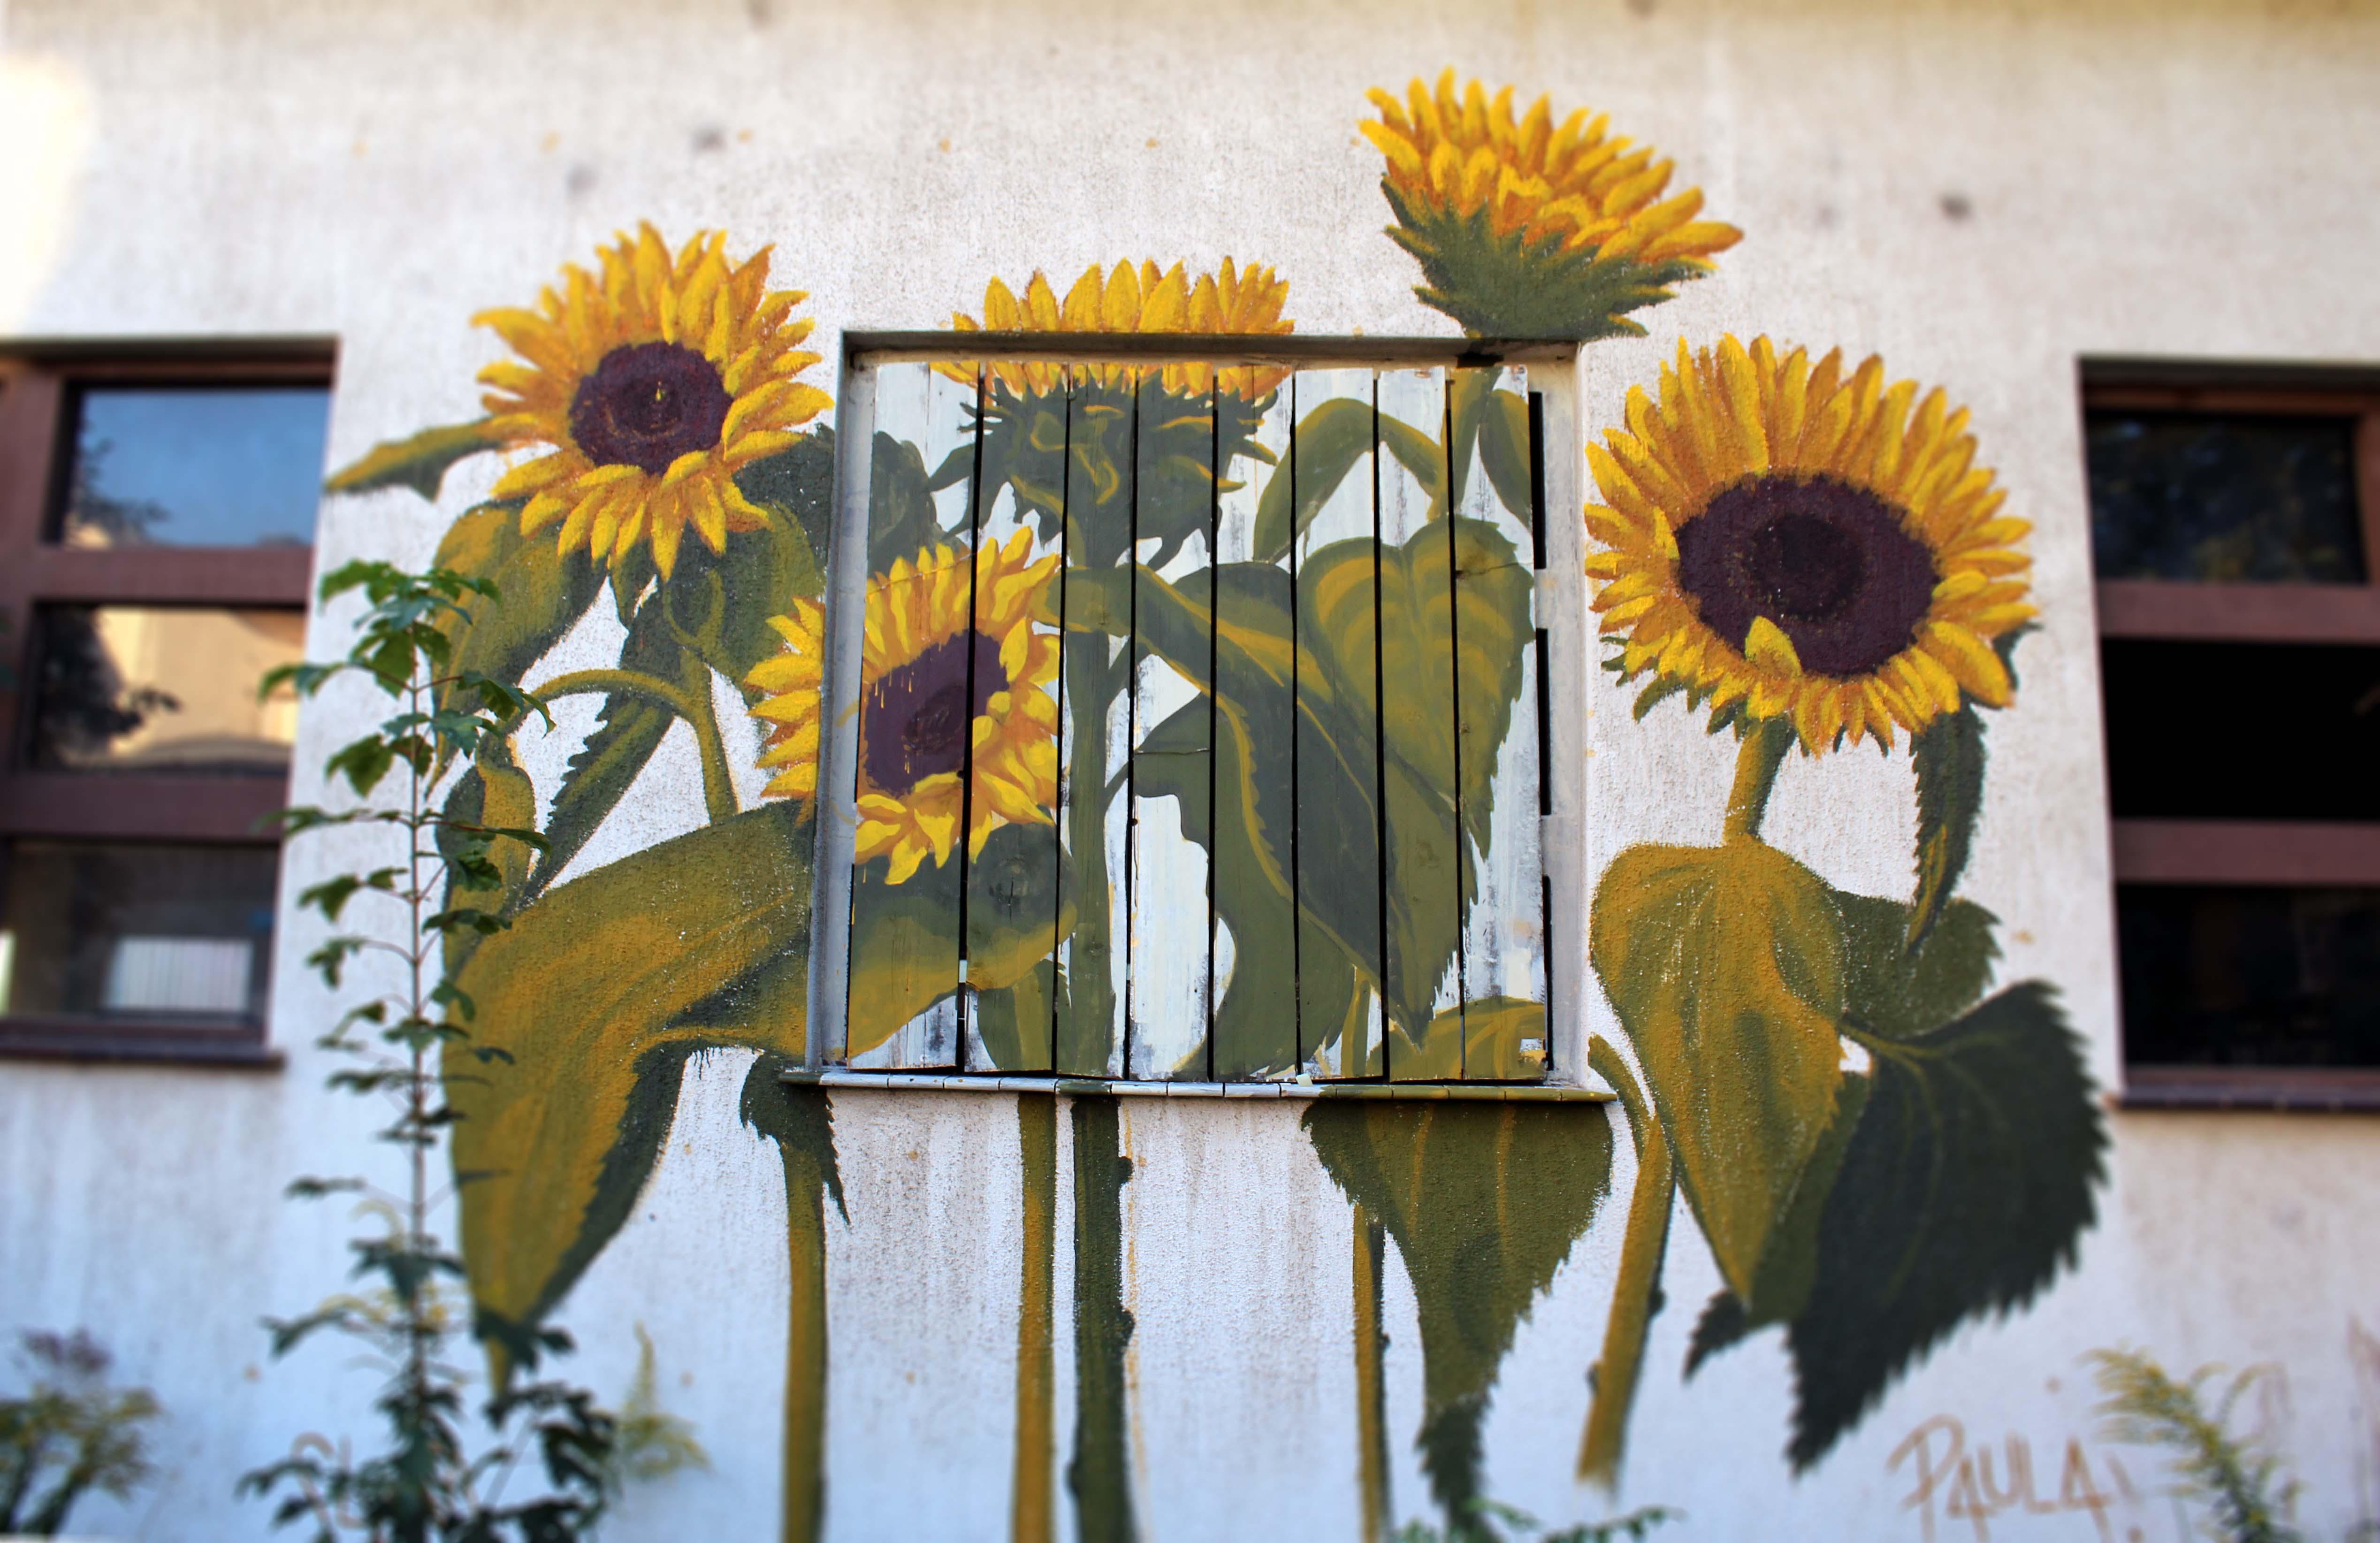 Sunflowers. with Paula Reichertz